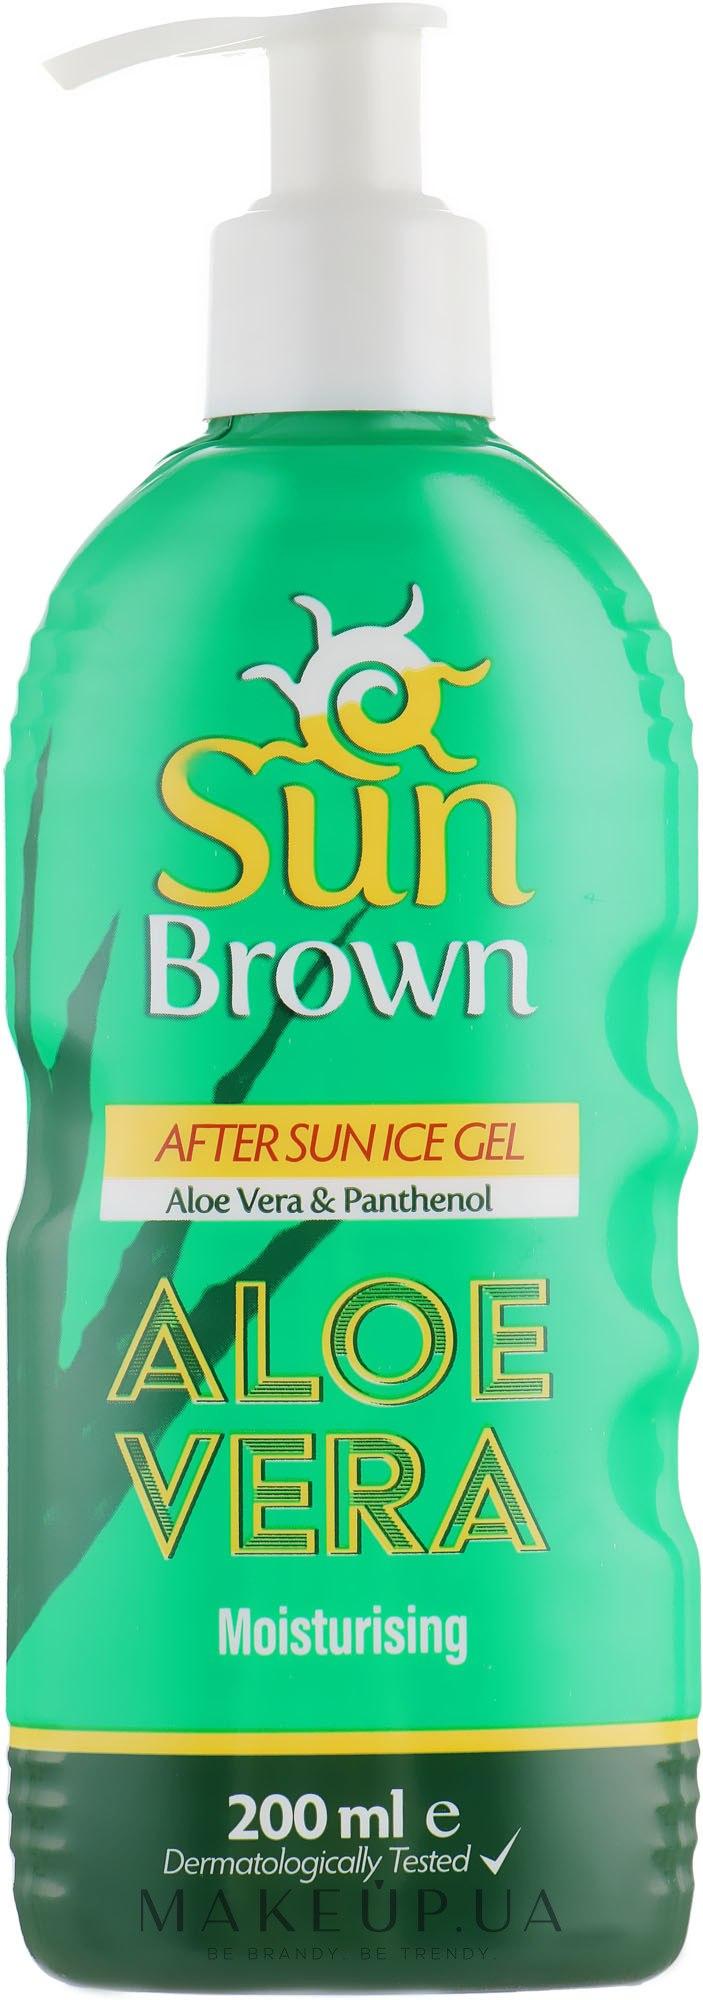 Увлажняющий гель с алое после загара - Sun Brown After Sun Aloe Vera Gel — фото 200ml